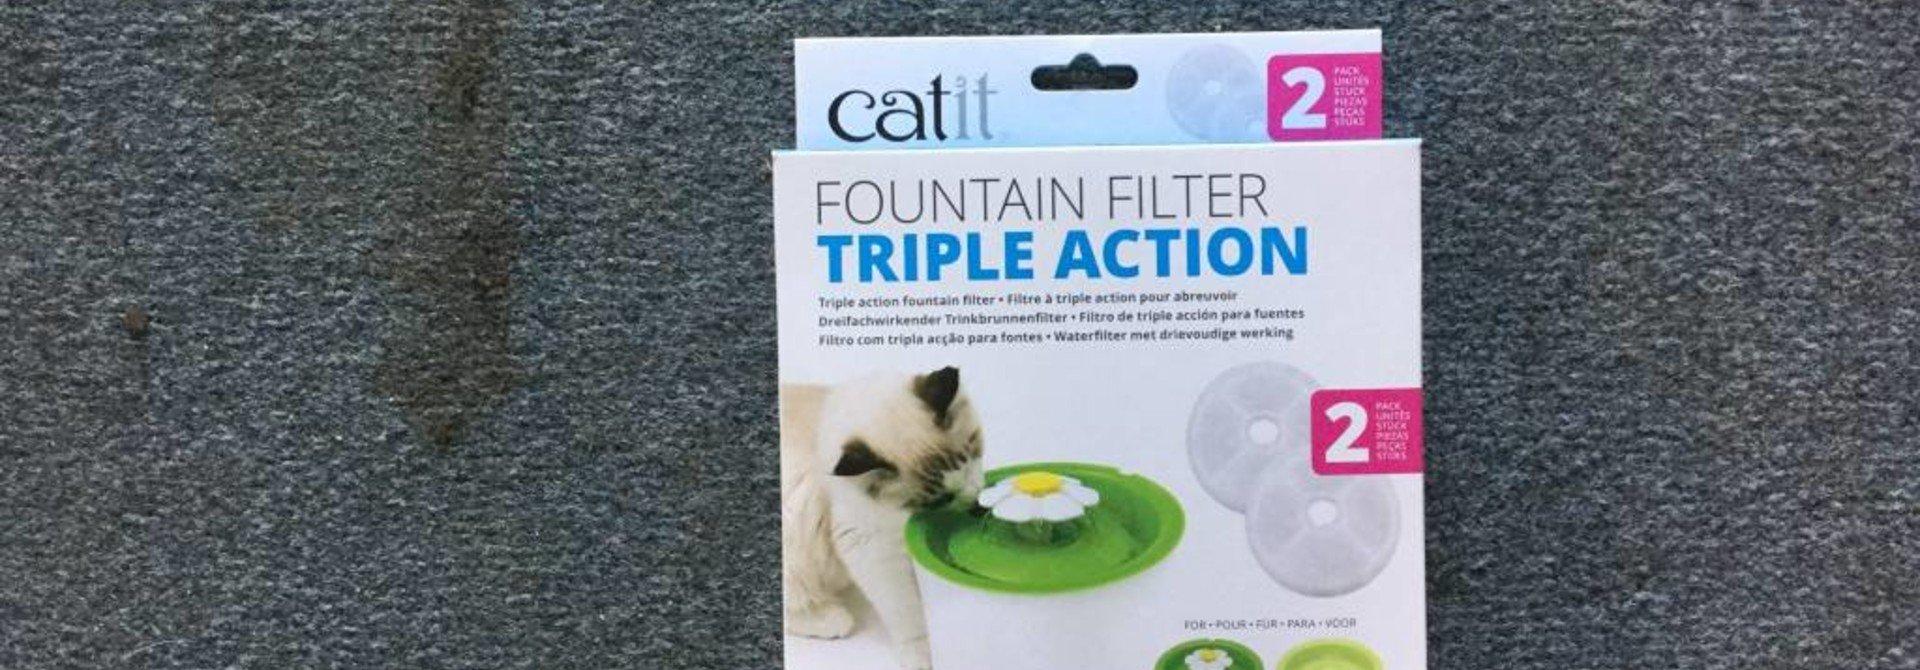 CA 2.0 Trpl Action Fntain Filter, 2 pk